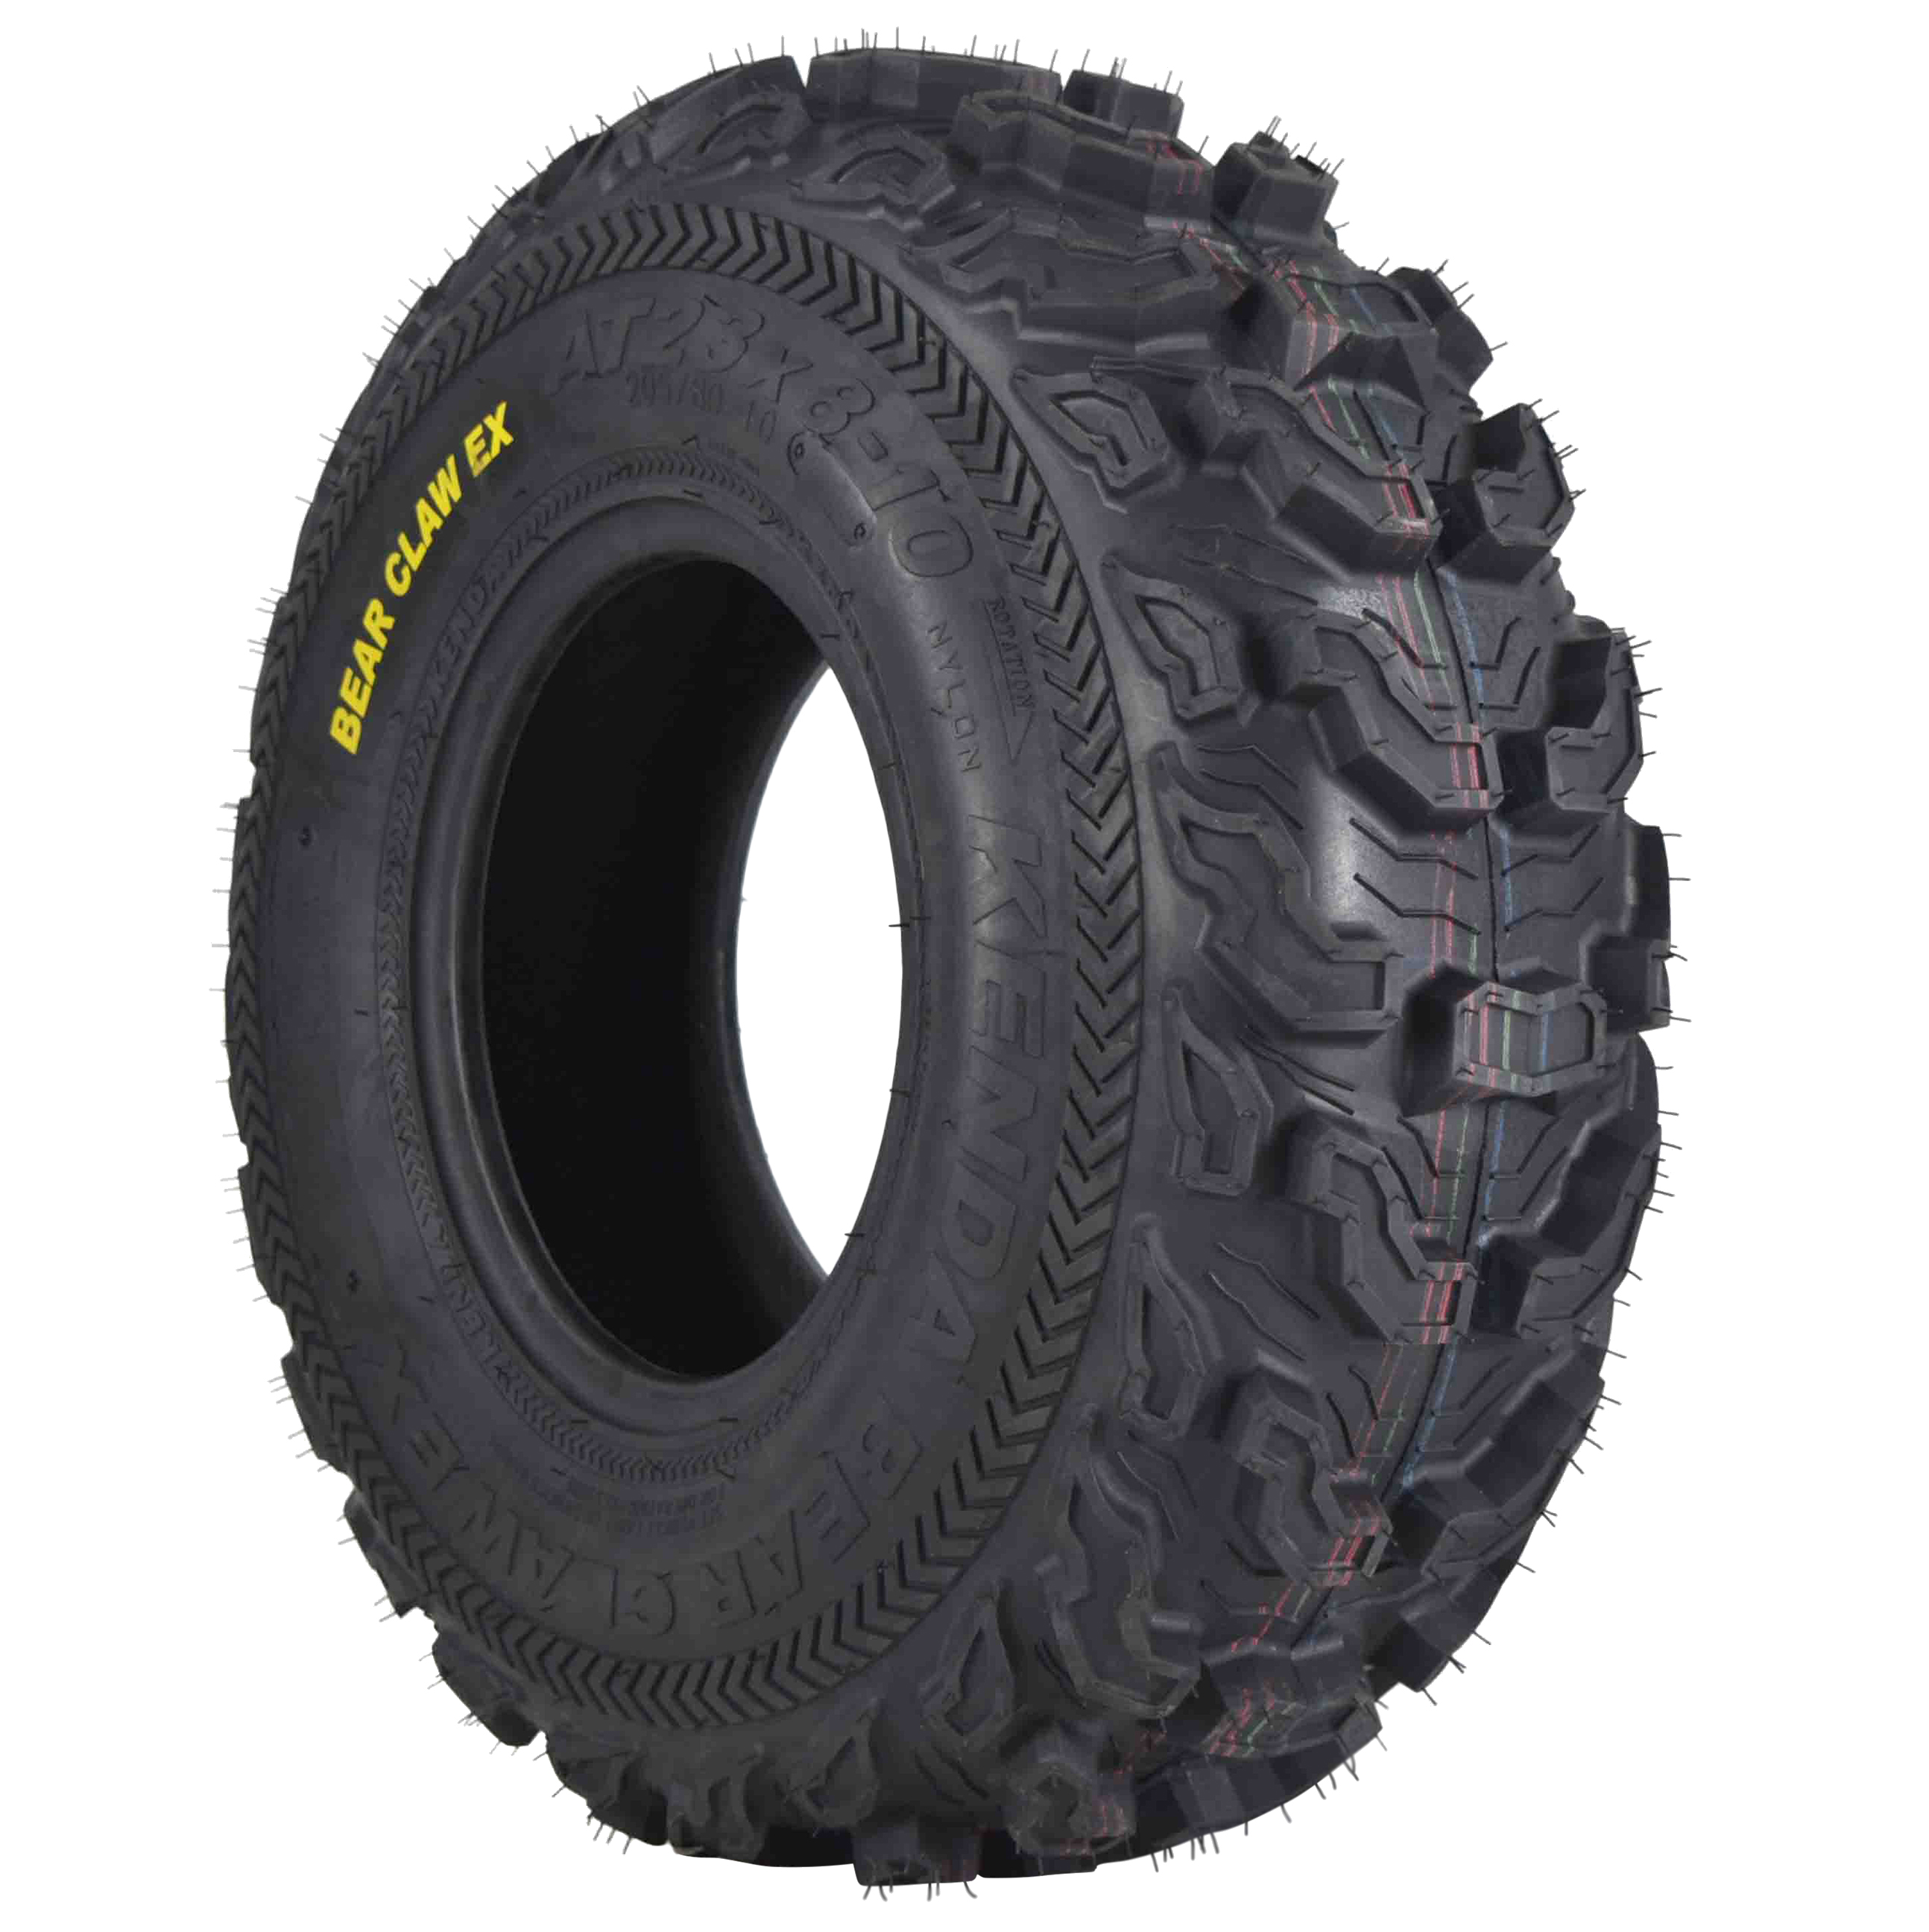 Kenda-Bear-Claw-EX-23x8-10-Front-ATV-6-PLY-Tire-Bearclaw-23x8x10-Single-Tire-image-1